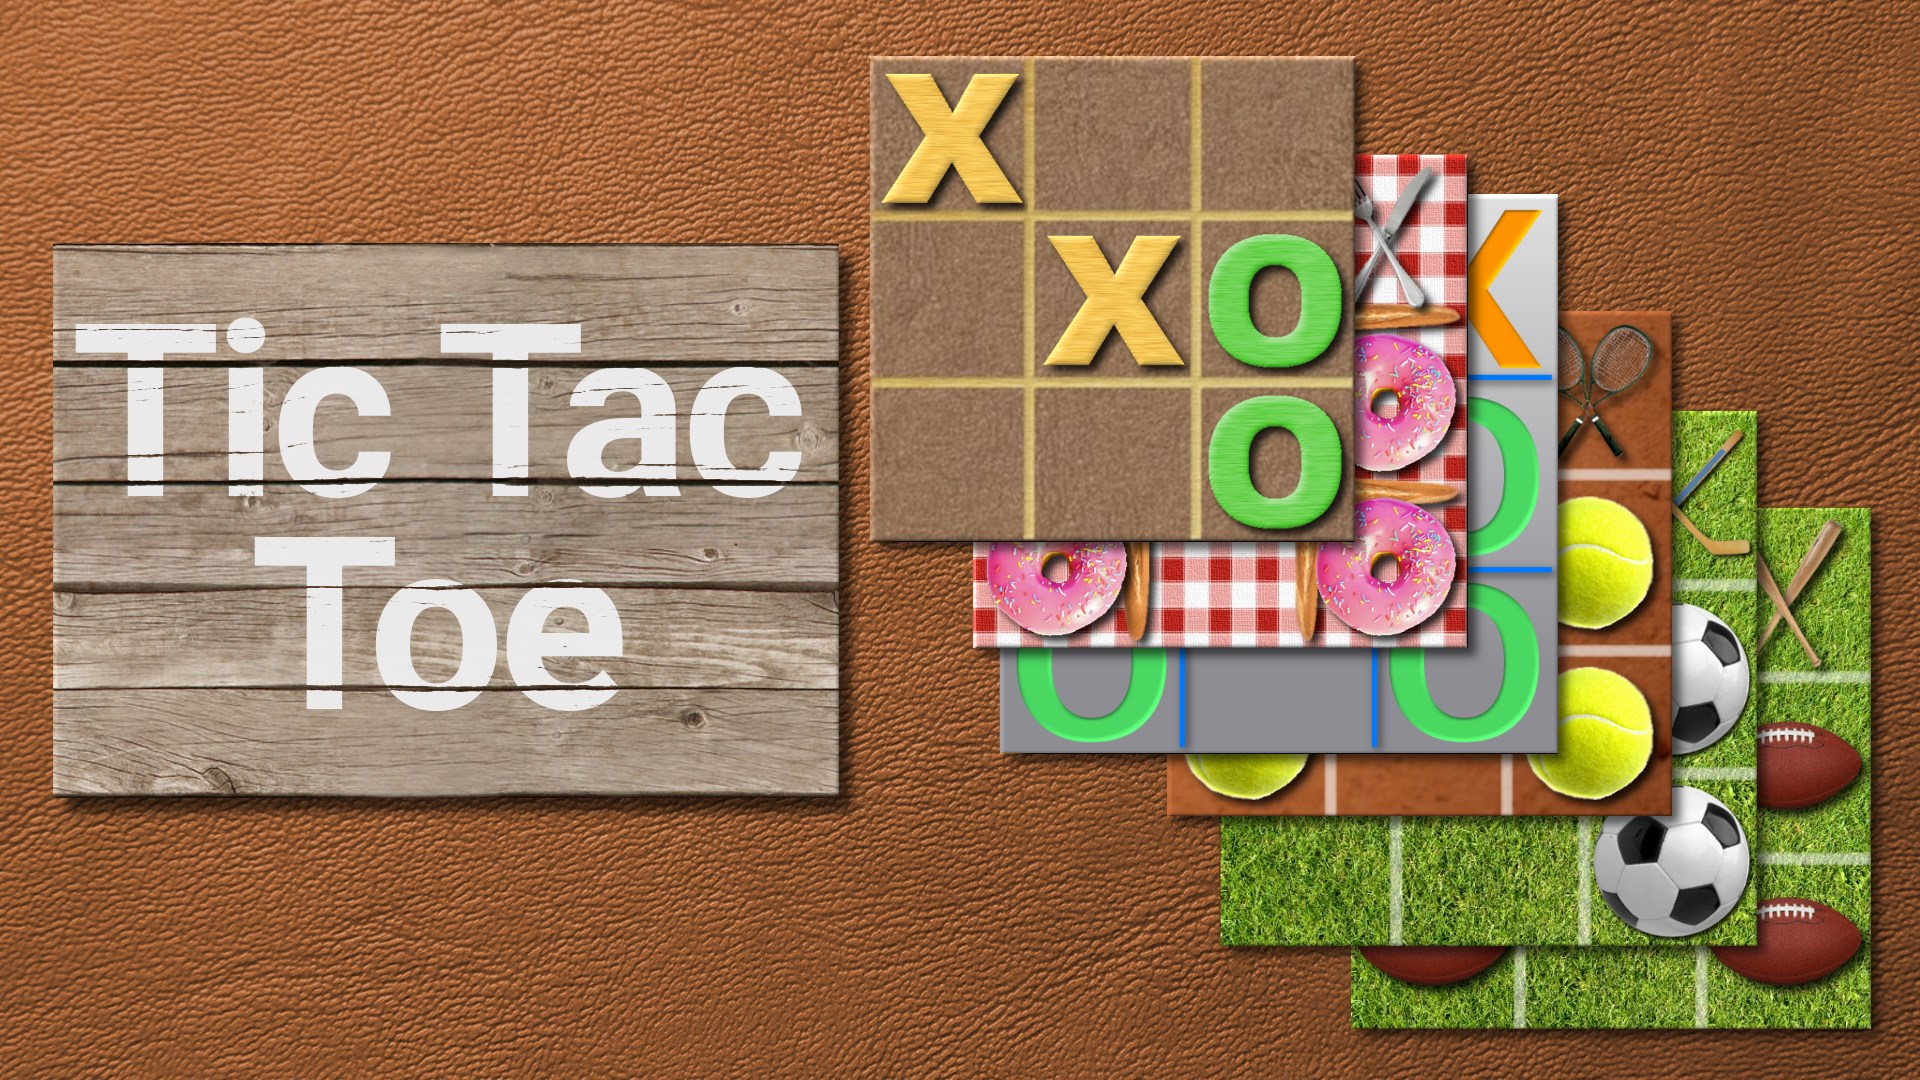 Behind VR Games: Tic-Tac-Toe